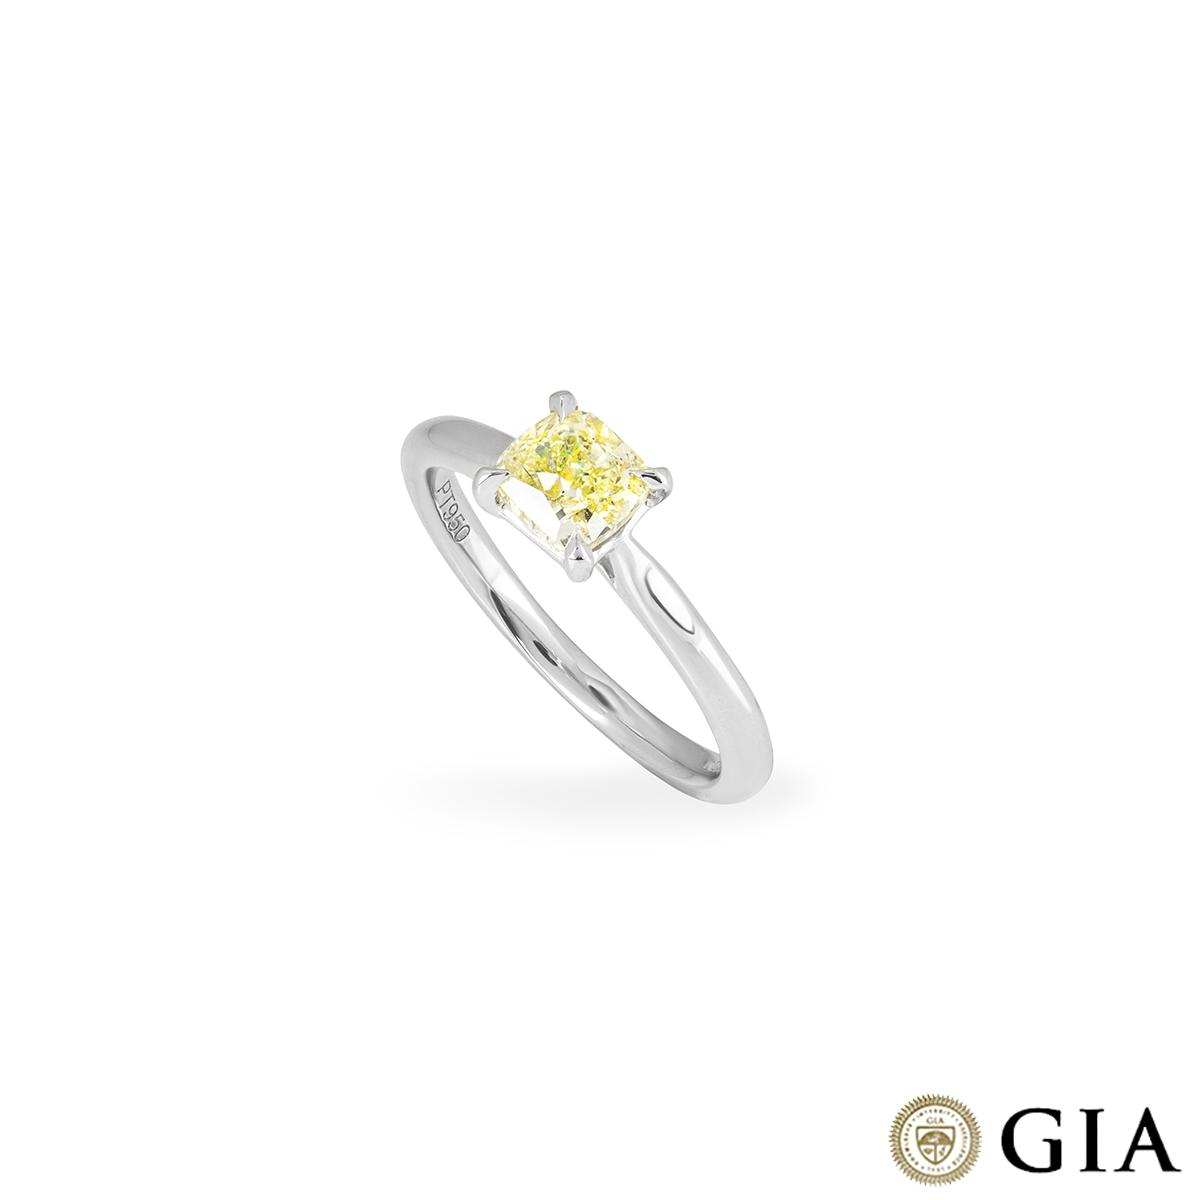 Cushion Cut Platinum Fancy Yellow Diamond Ring 1.01ct SI1